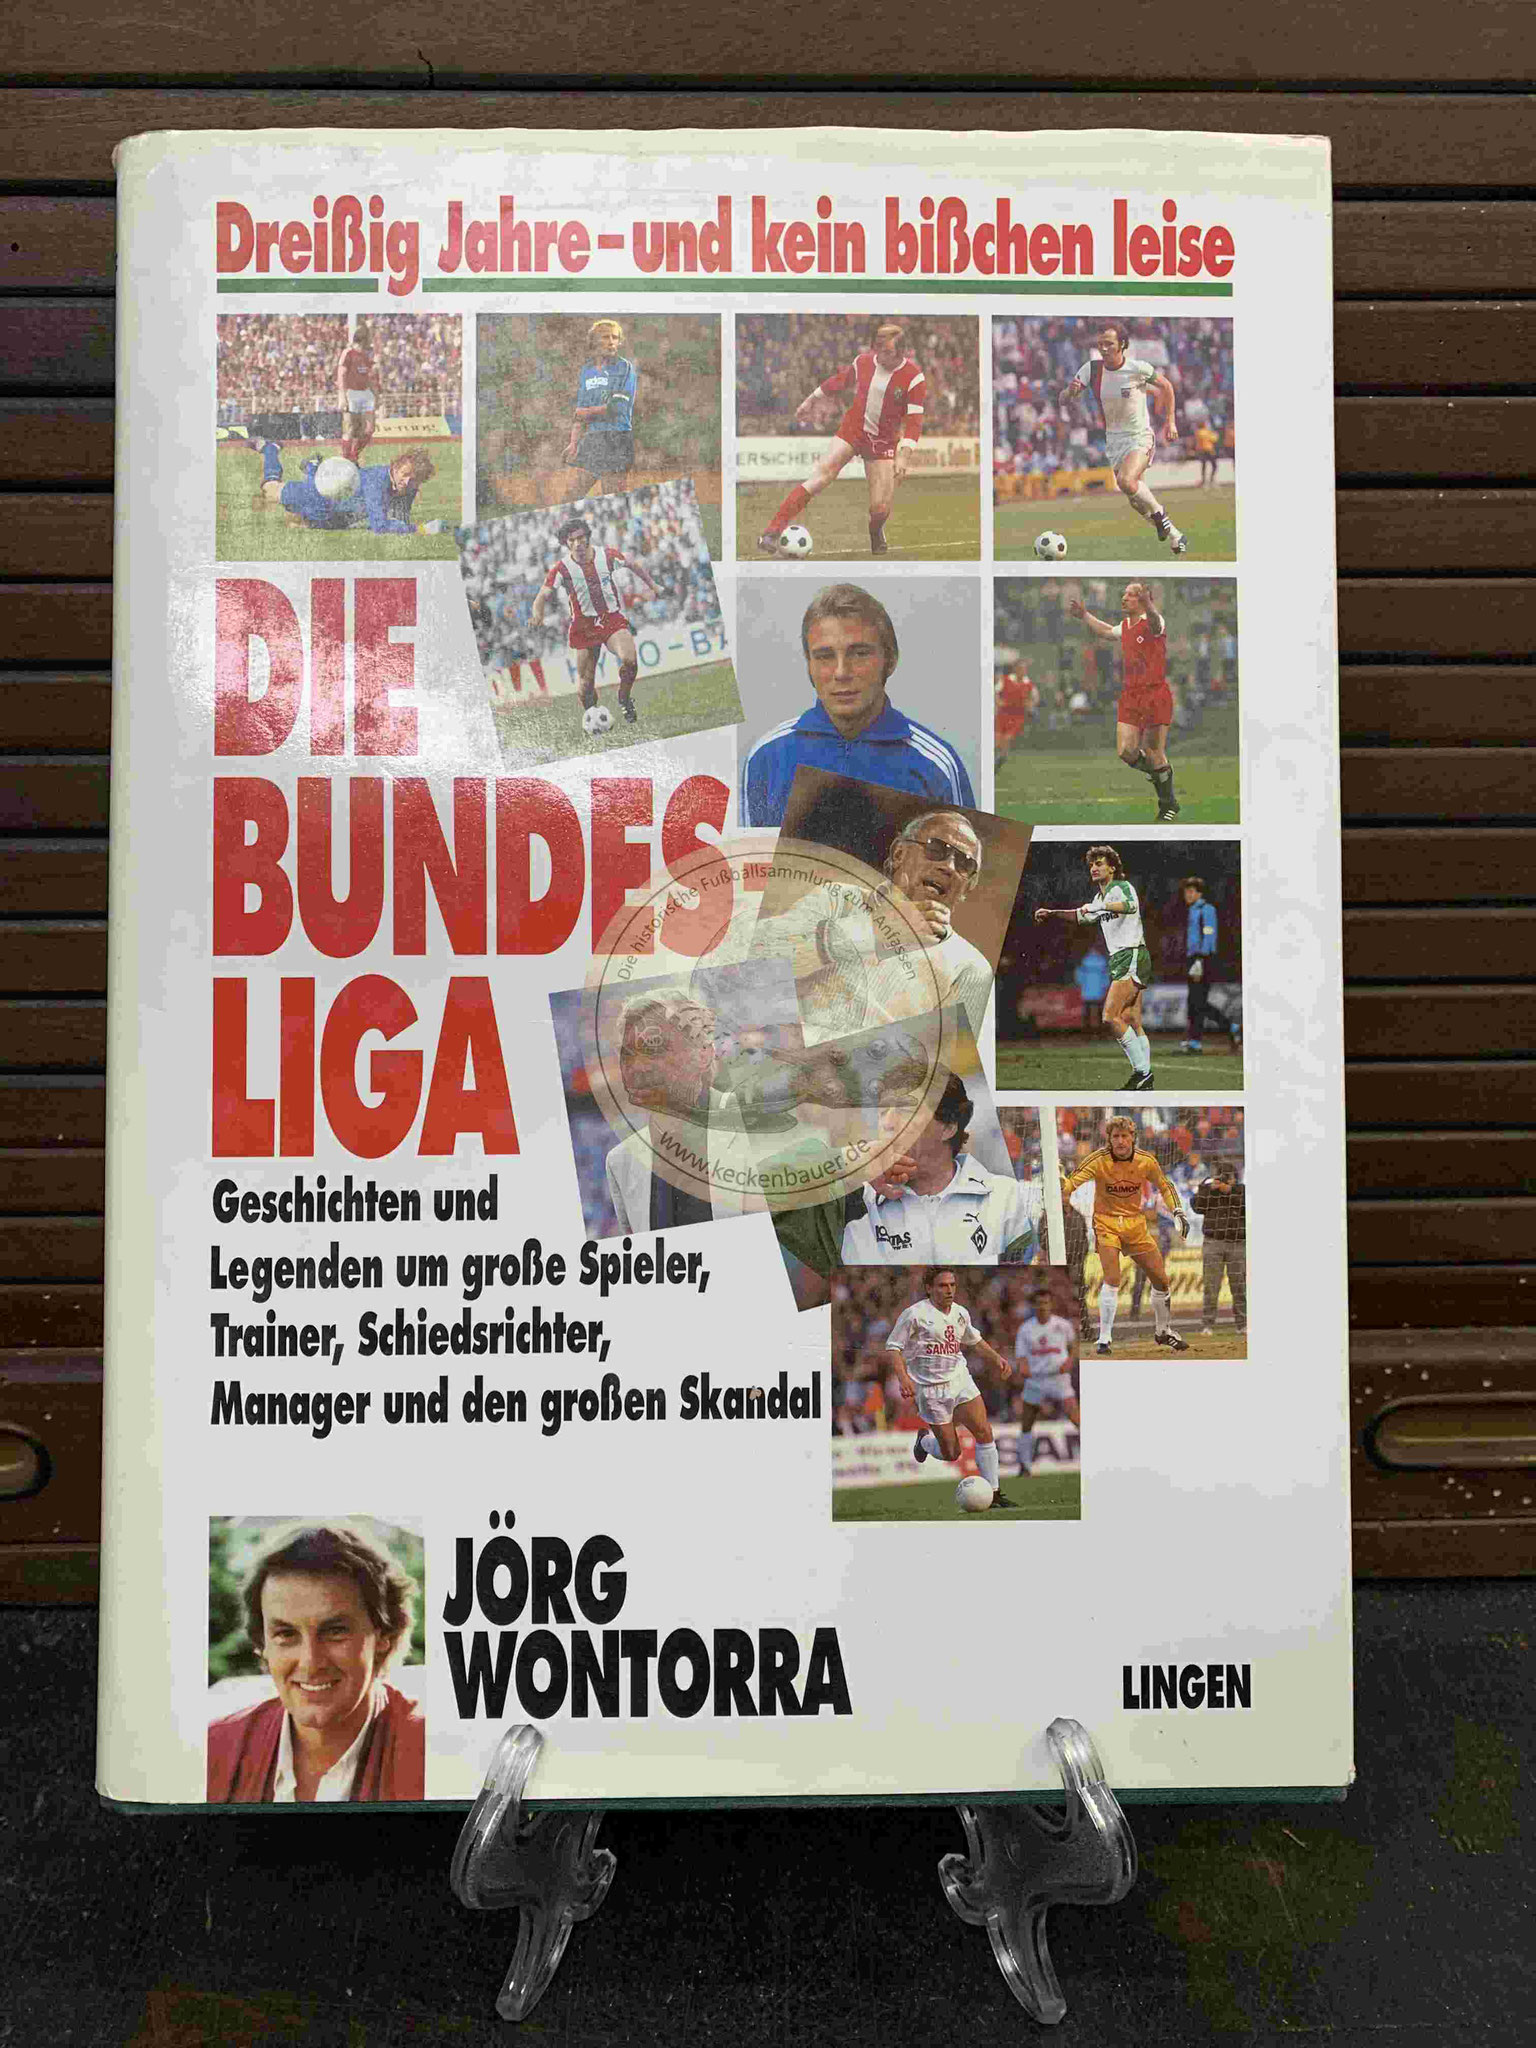 Jörg Wontarra Die Bundesliga aus dem Jahr 1993